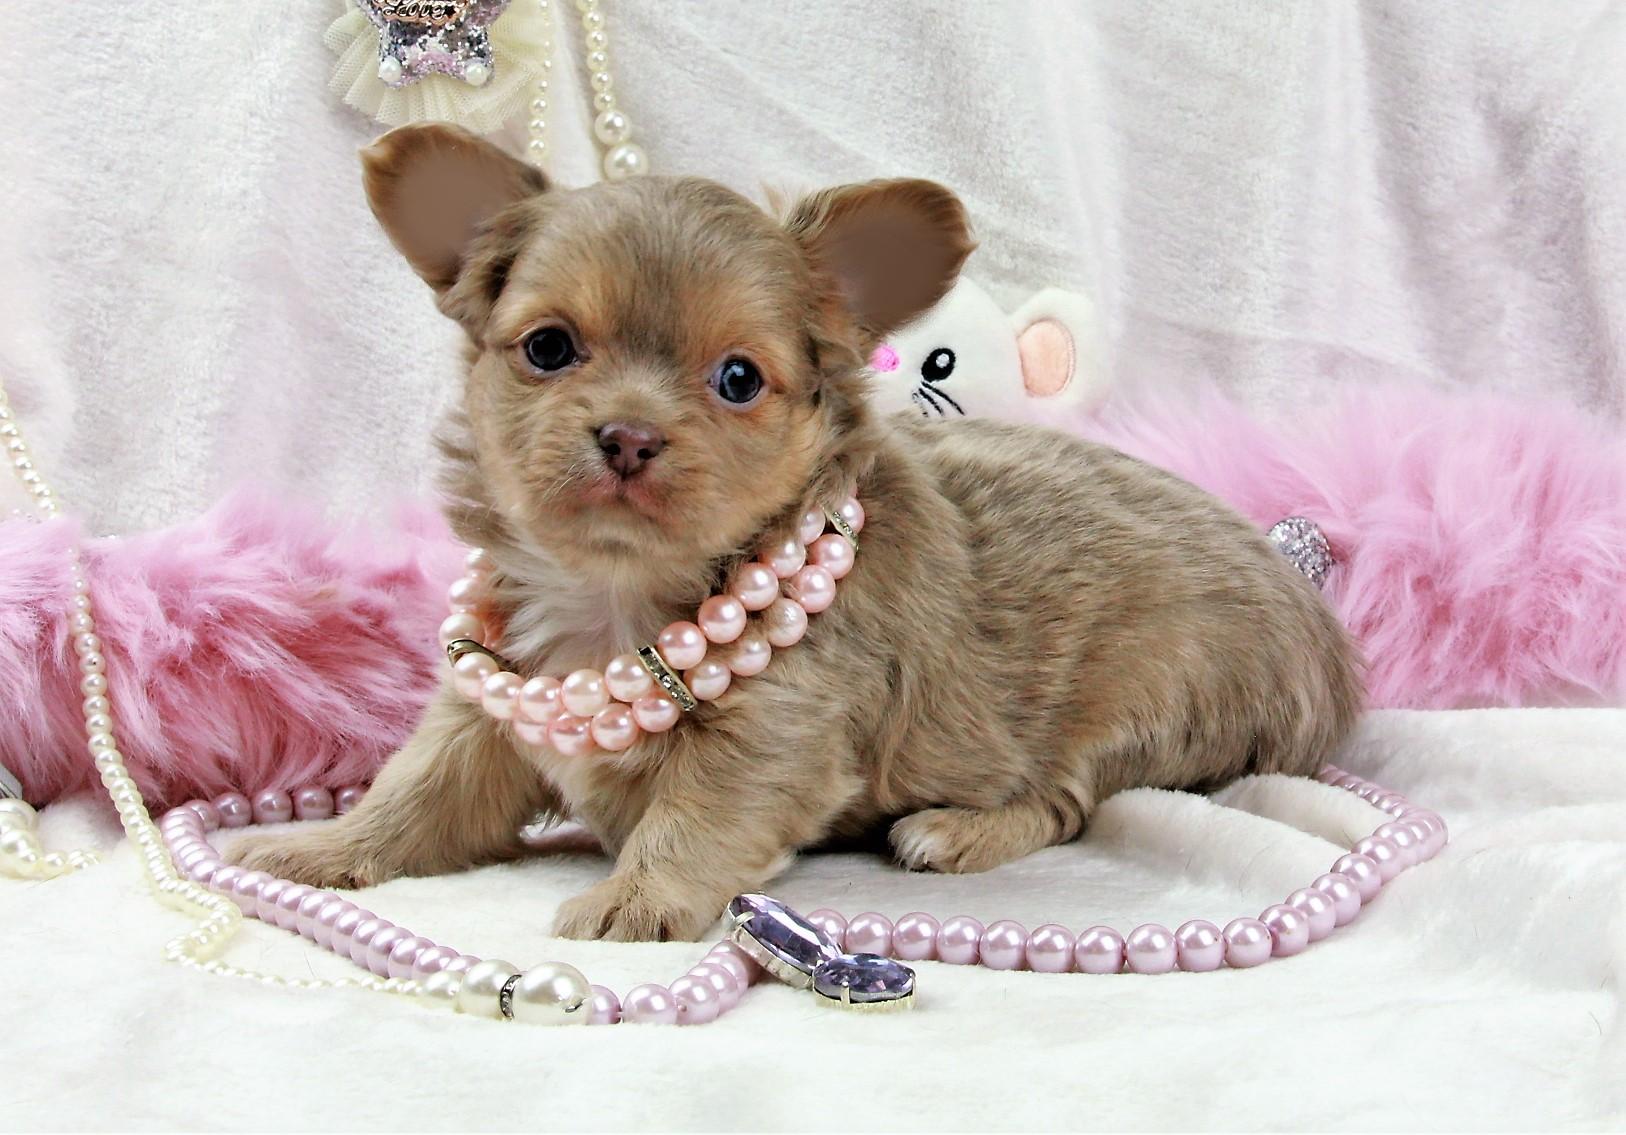 OSEE, femelle Chihuahua poil long lavande et tan